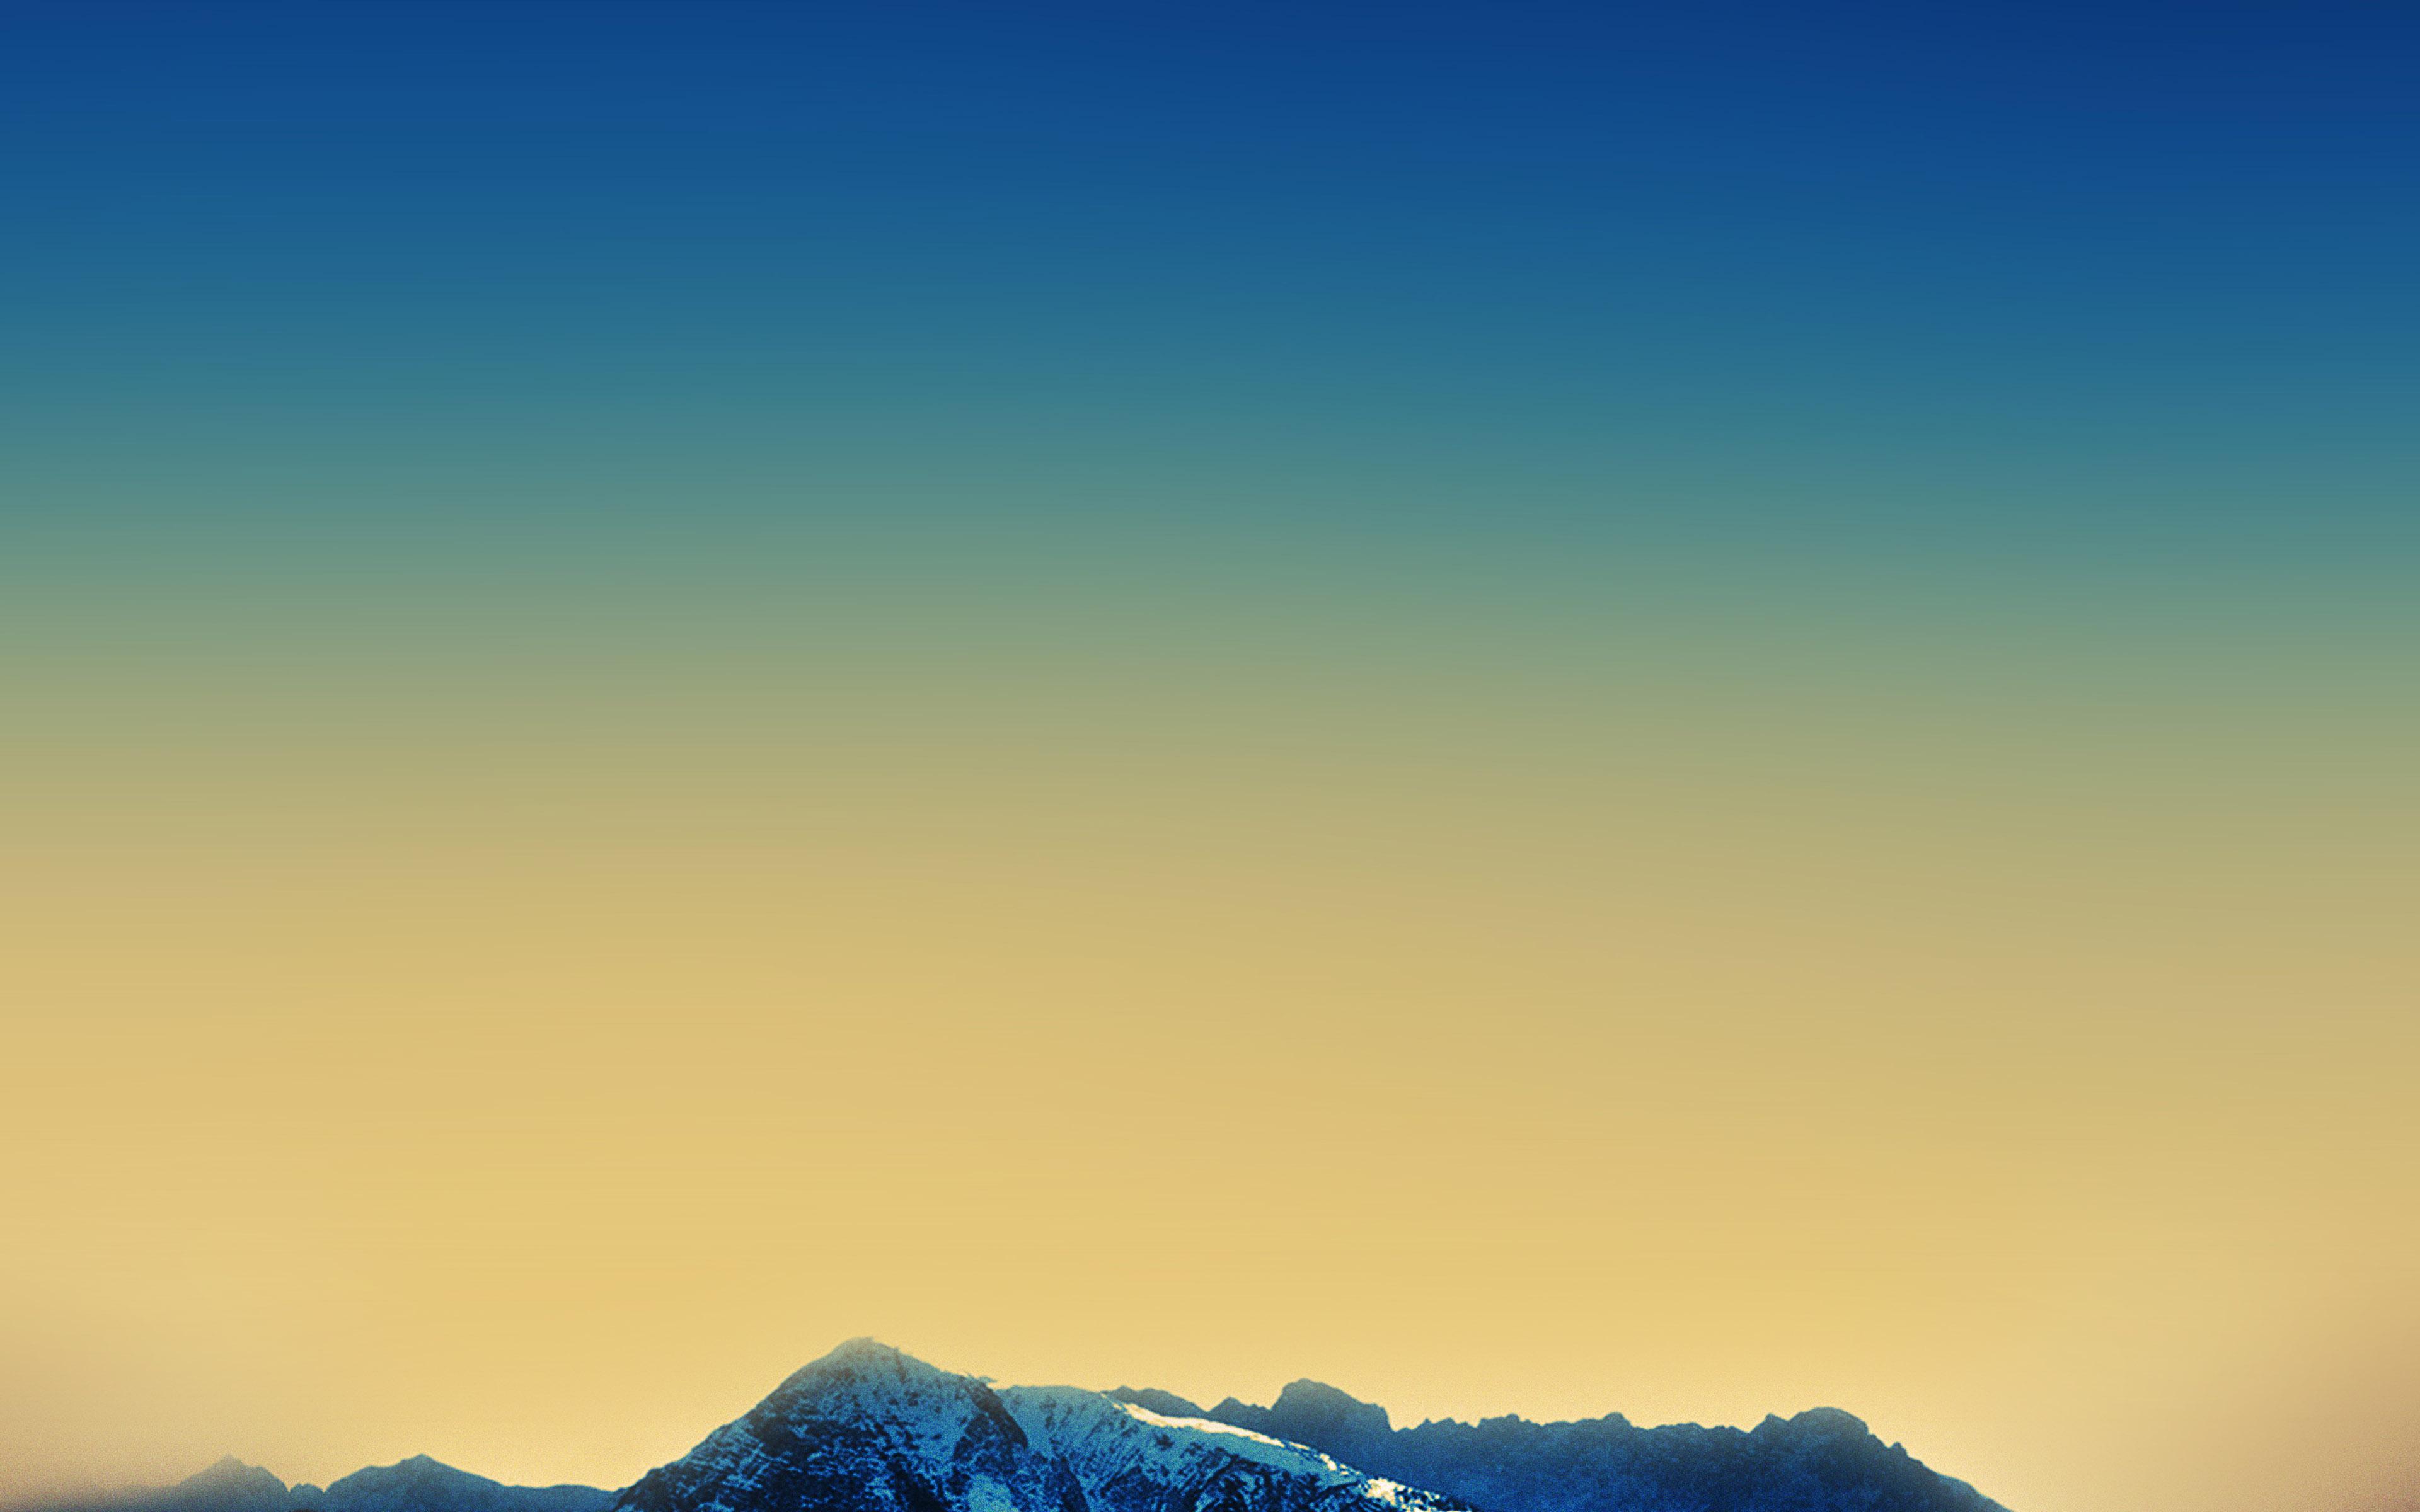 af27-ipad-air-2-dark-blue-wallpaper-official-mountain-apple-art